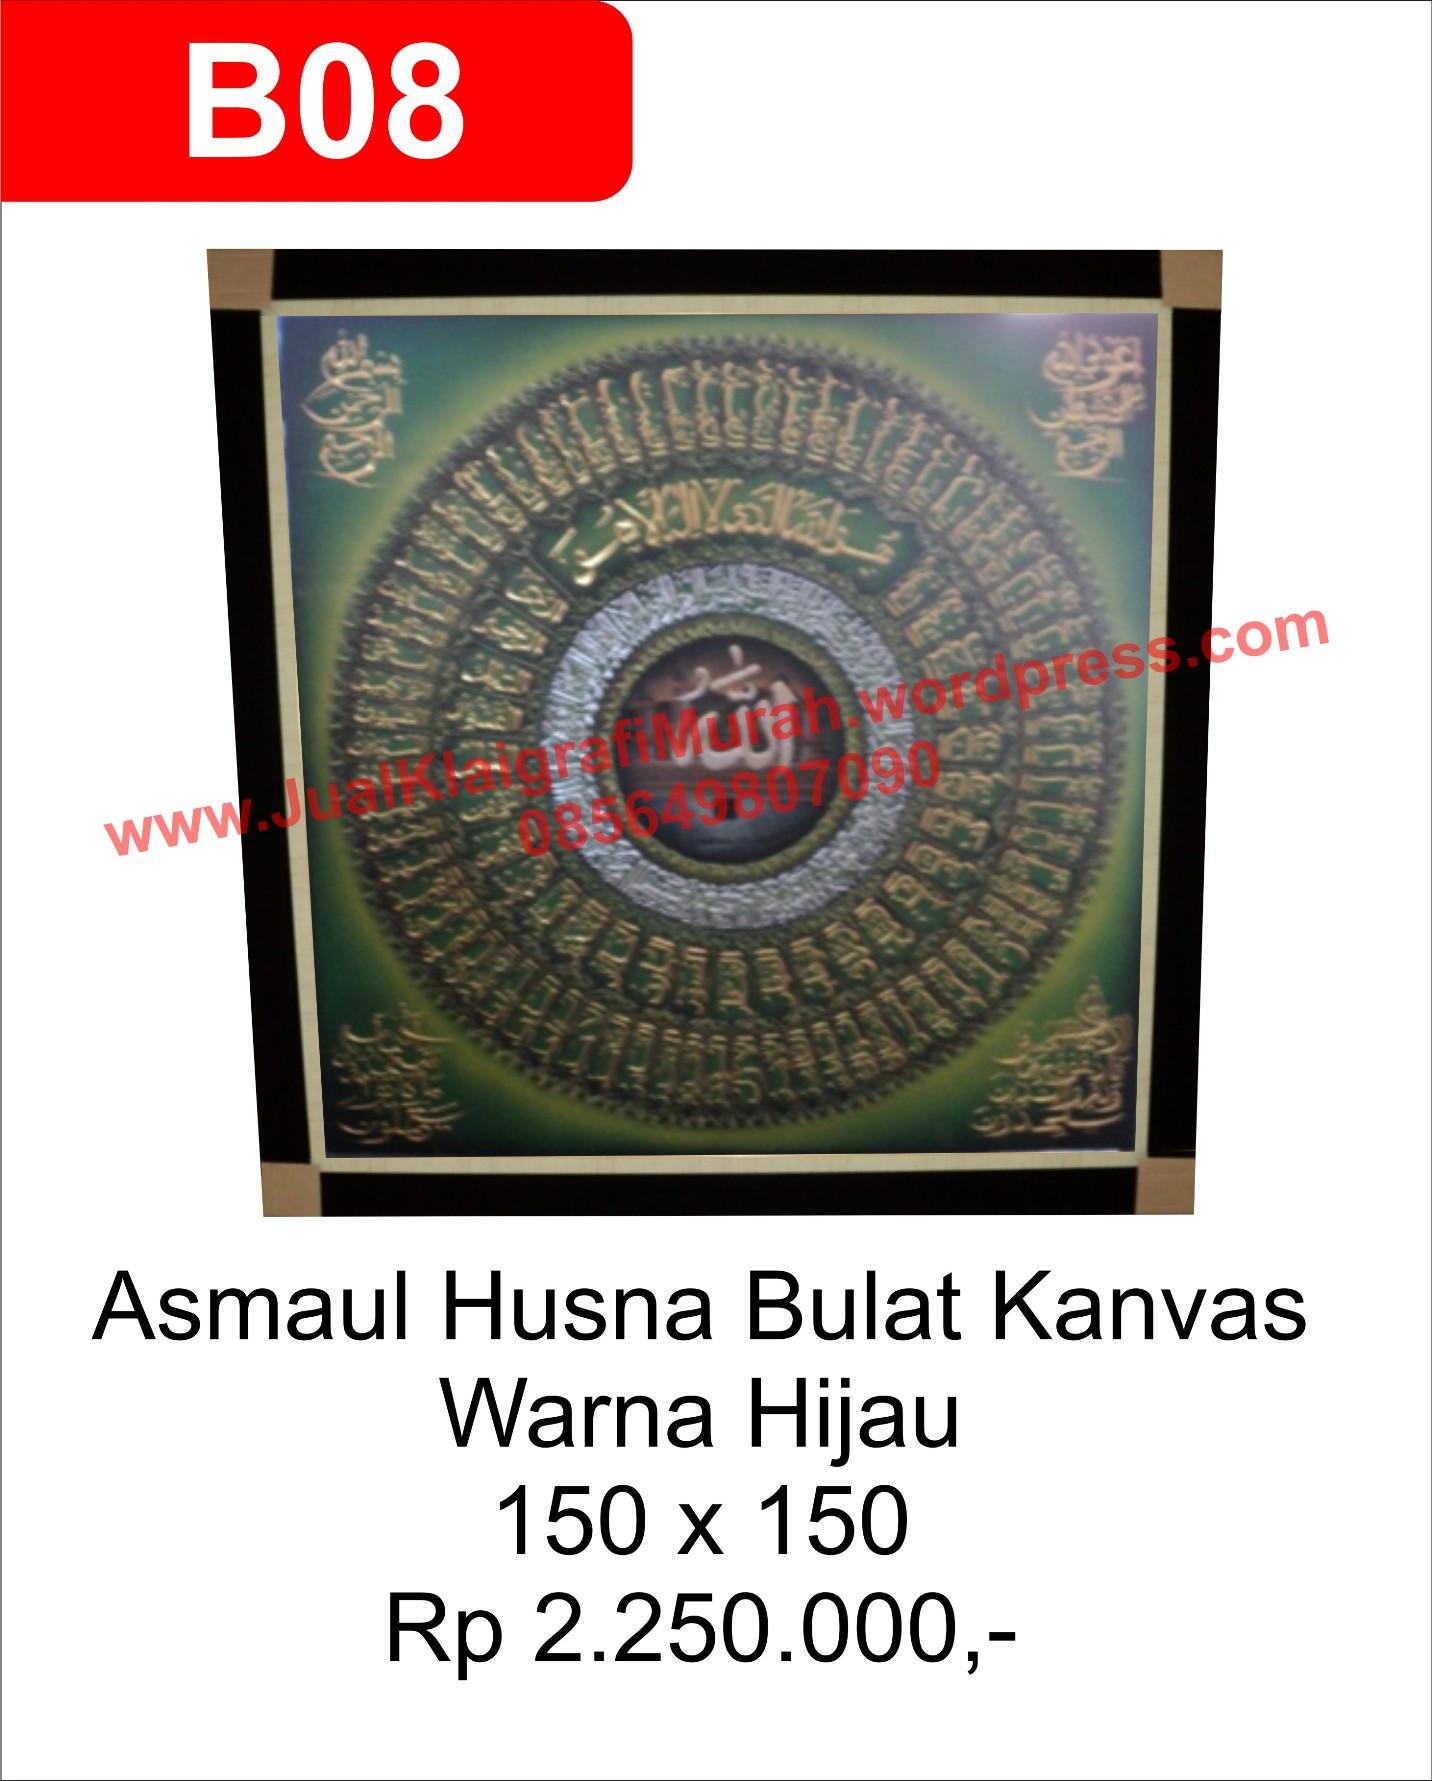 b08-asmaul-husna-bulat-kanvas-warna-hijau-graha-kaligrafi-e28093 ...